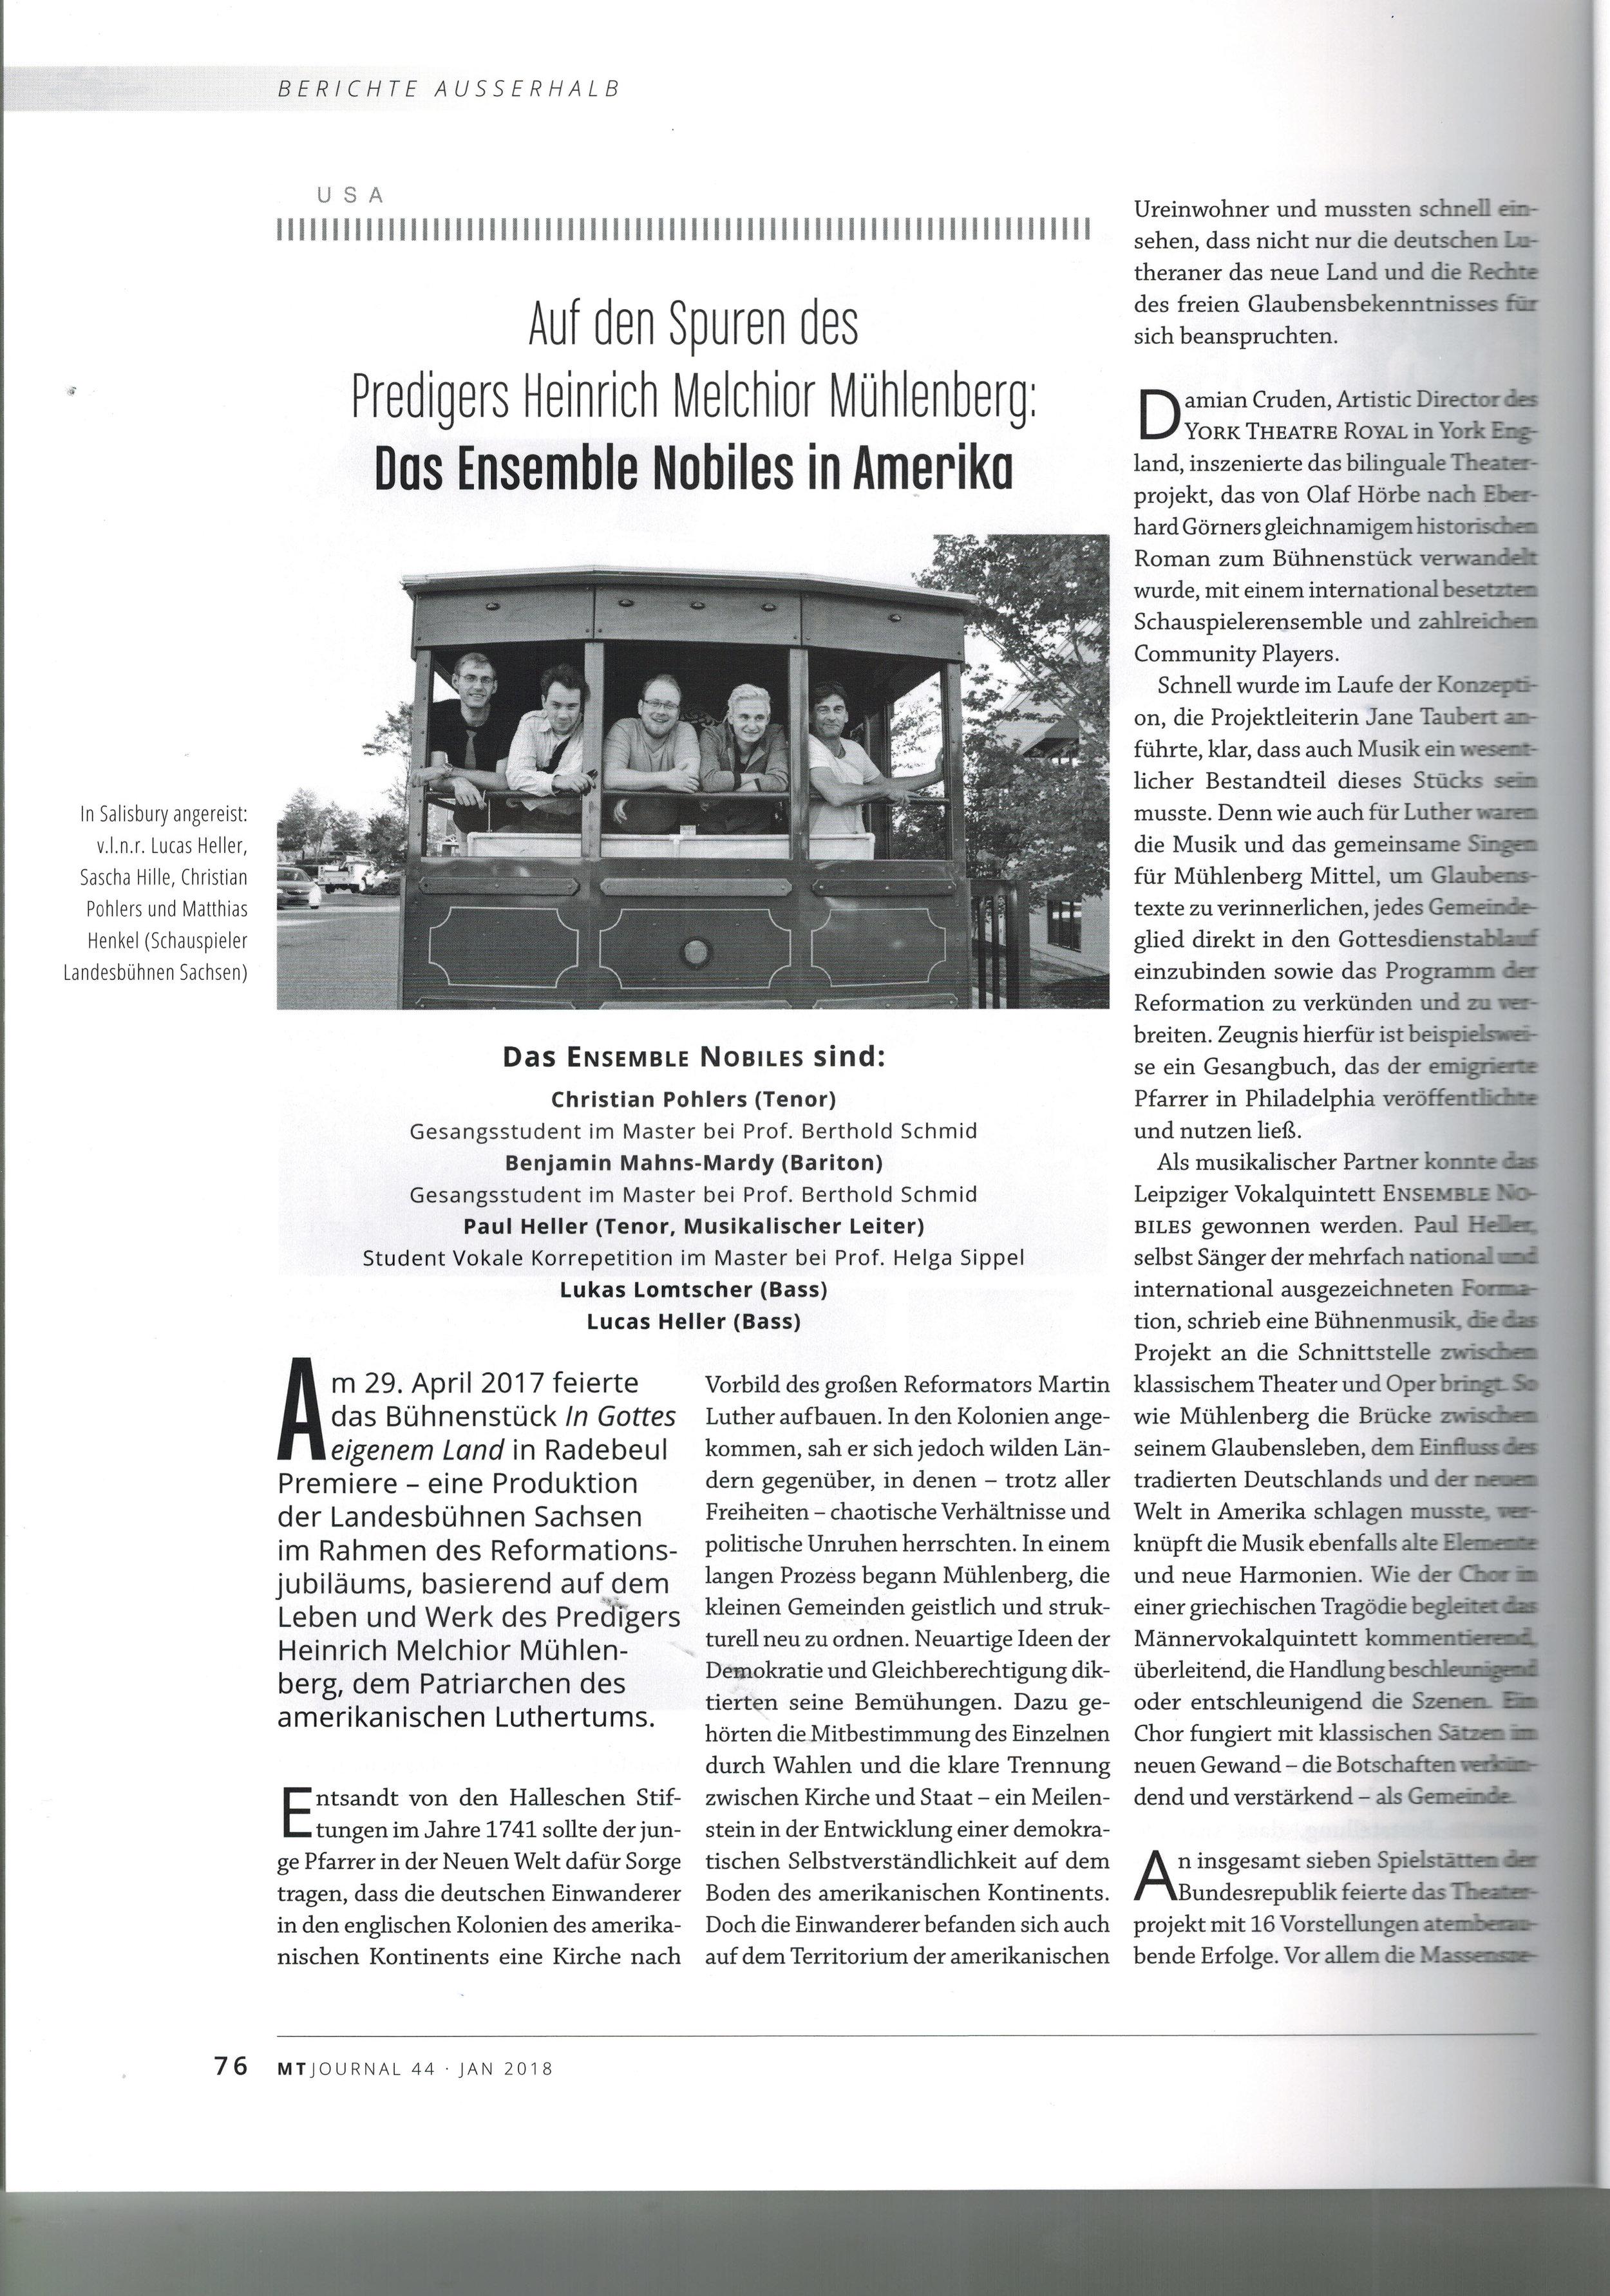 MT Journal  44 Januar - Wintersemester 2018 - S. 76